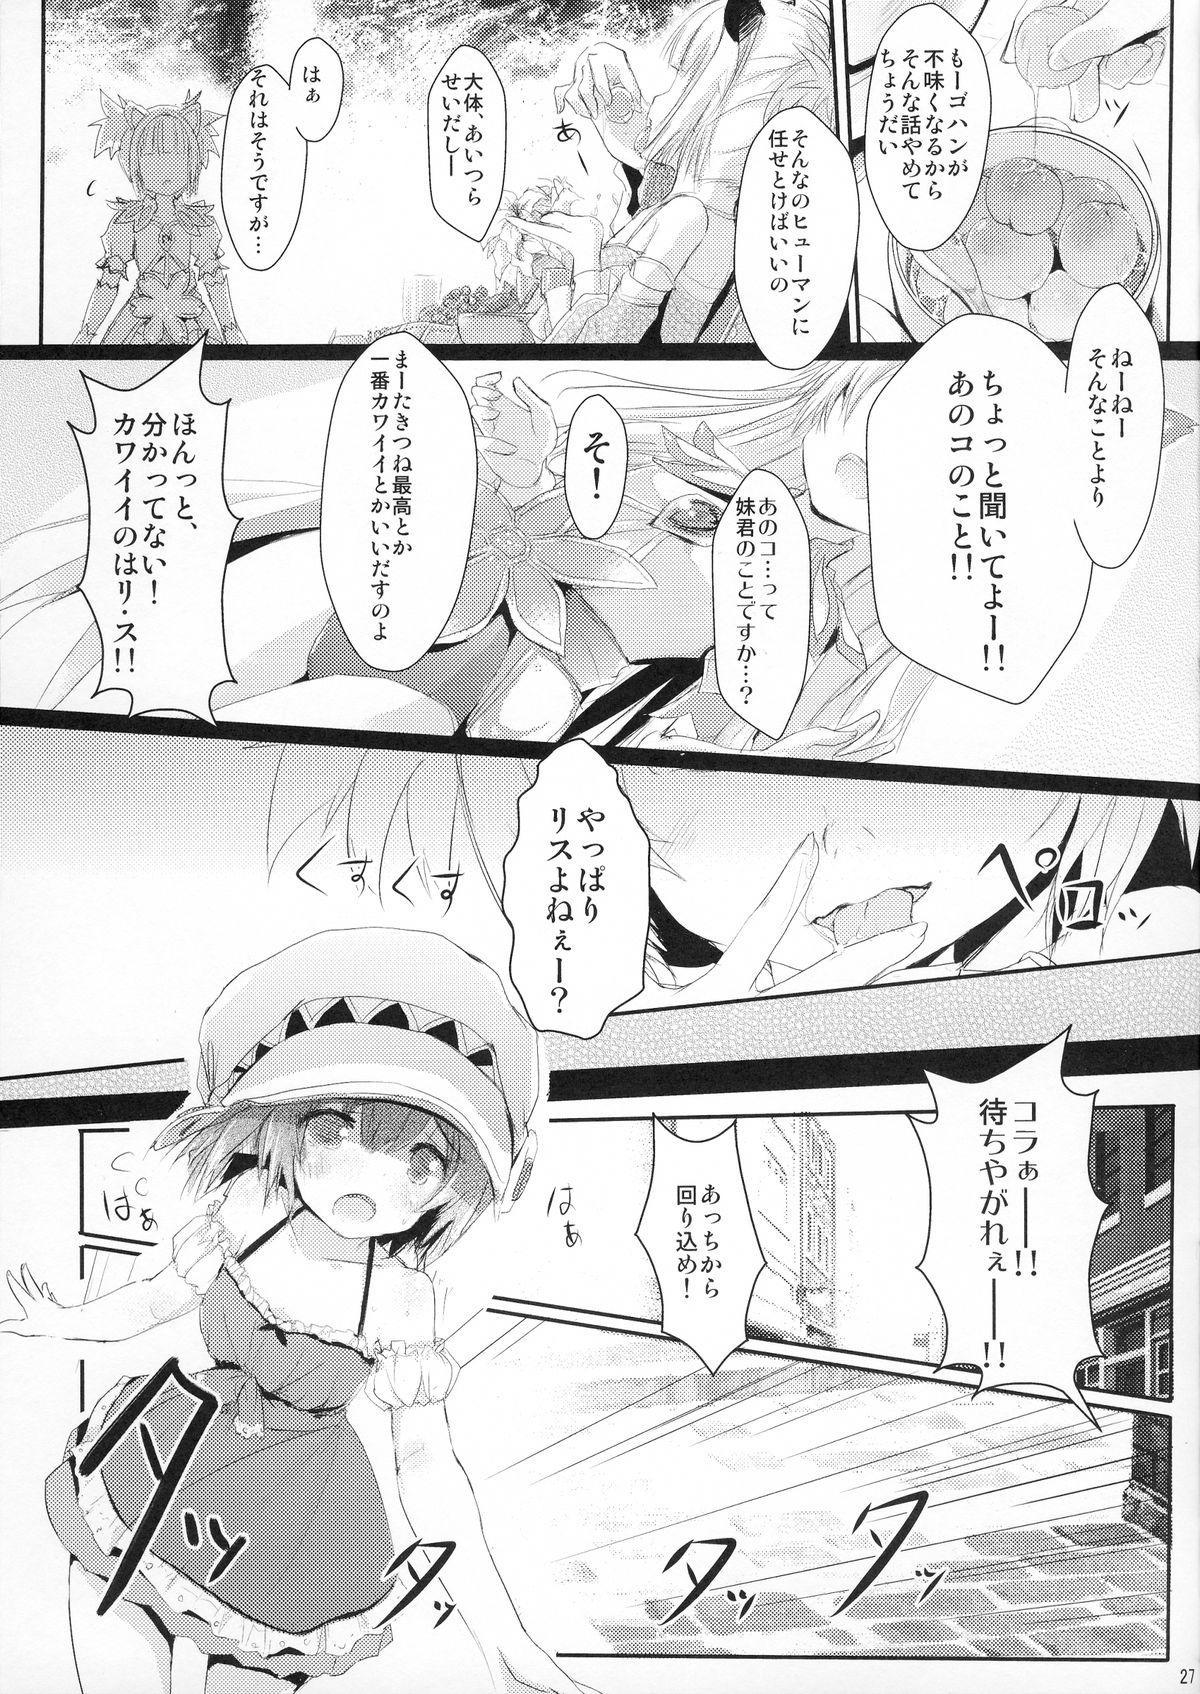 [Mirukomi (PRIMIL)] Human wa Erin-chan ni Hidoi Koto Shitai yo ne - ELIN's the best - (TERA The Exiled Realm of Arborea) 26